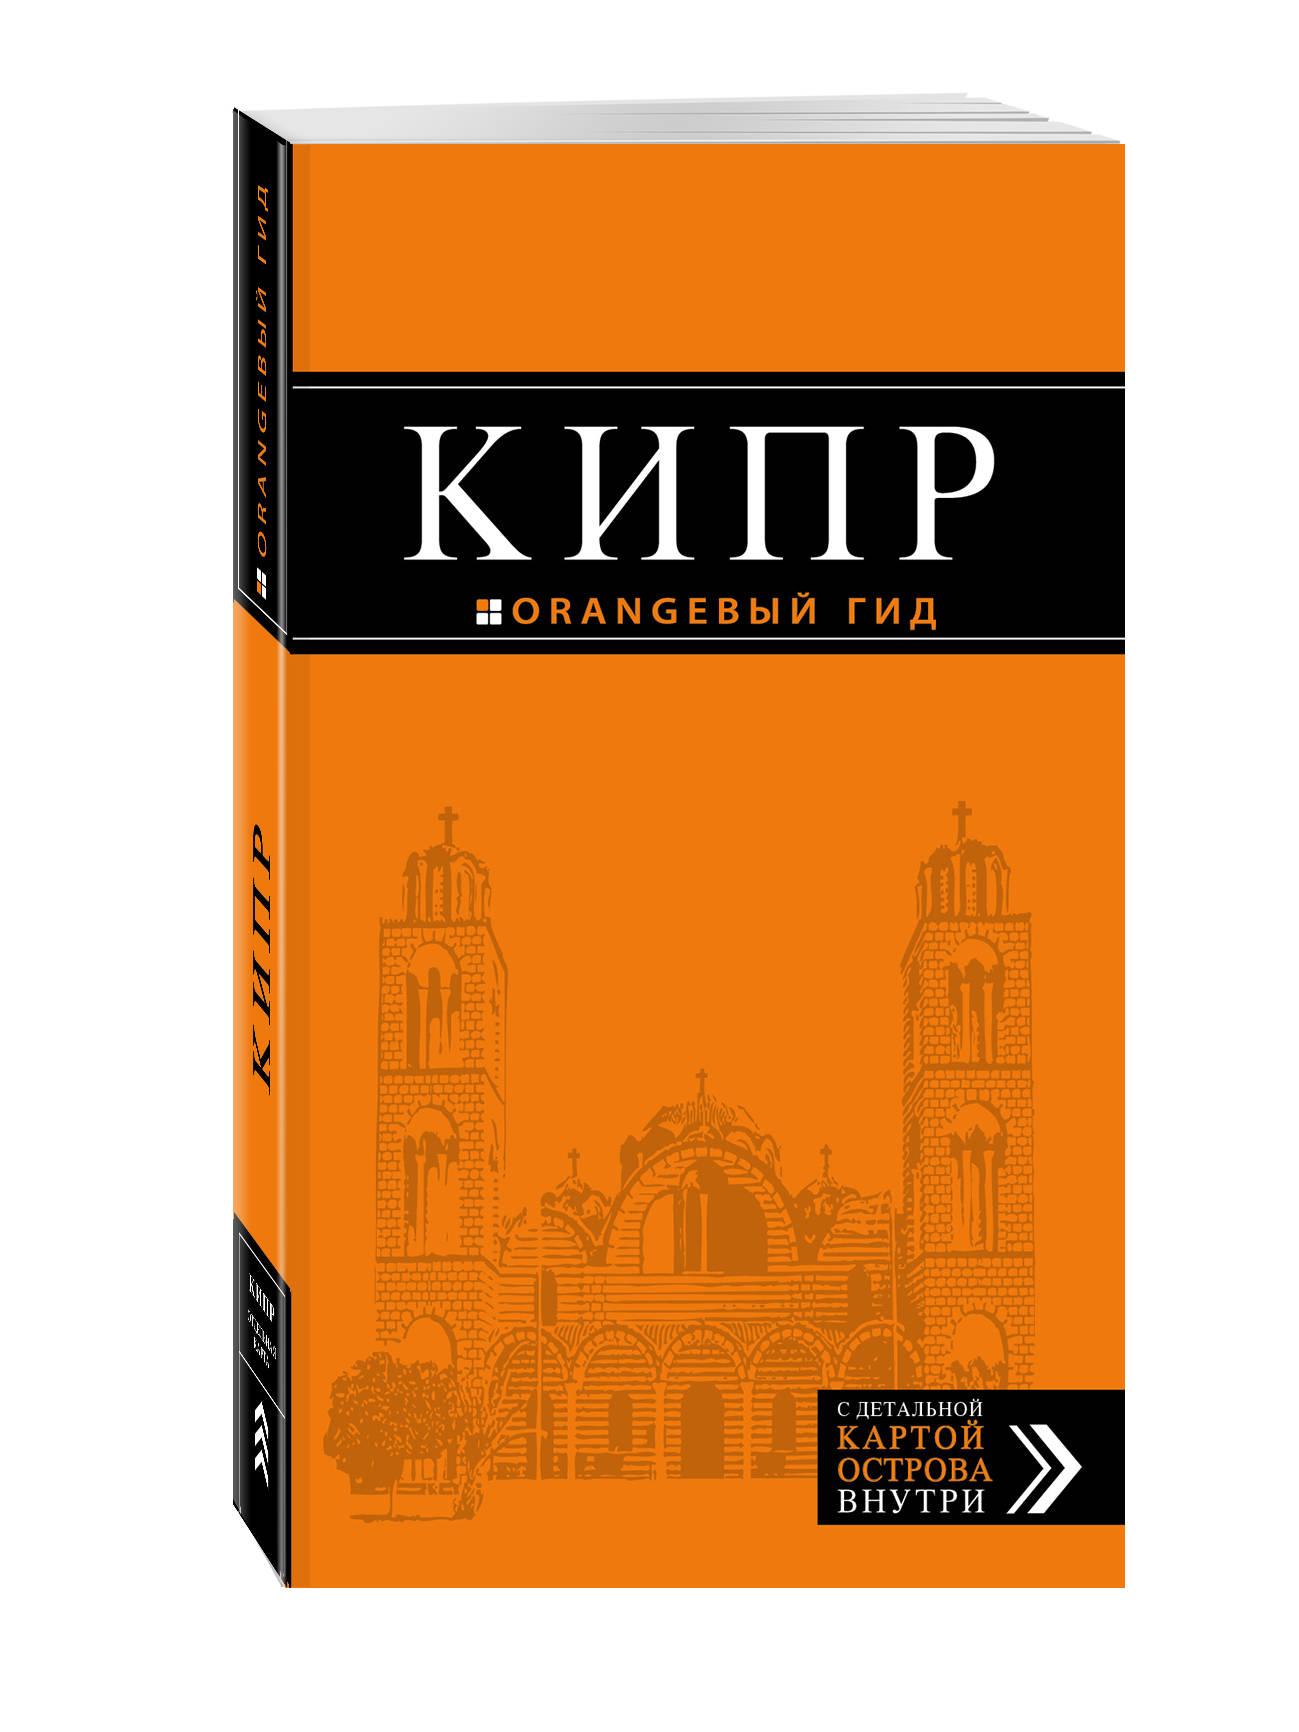 Кипр: путеводитель. 5-е изд., испр. и доп. ( Александрова А.  )